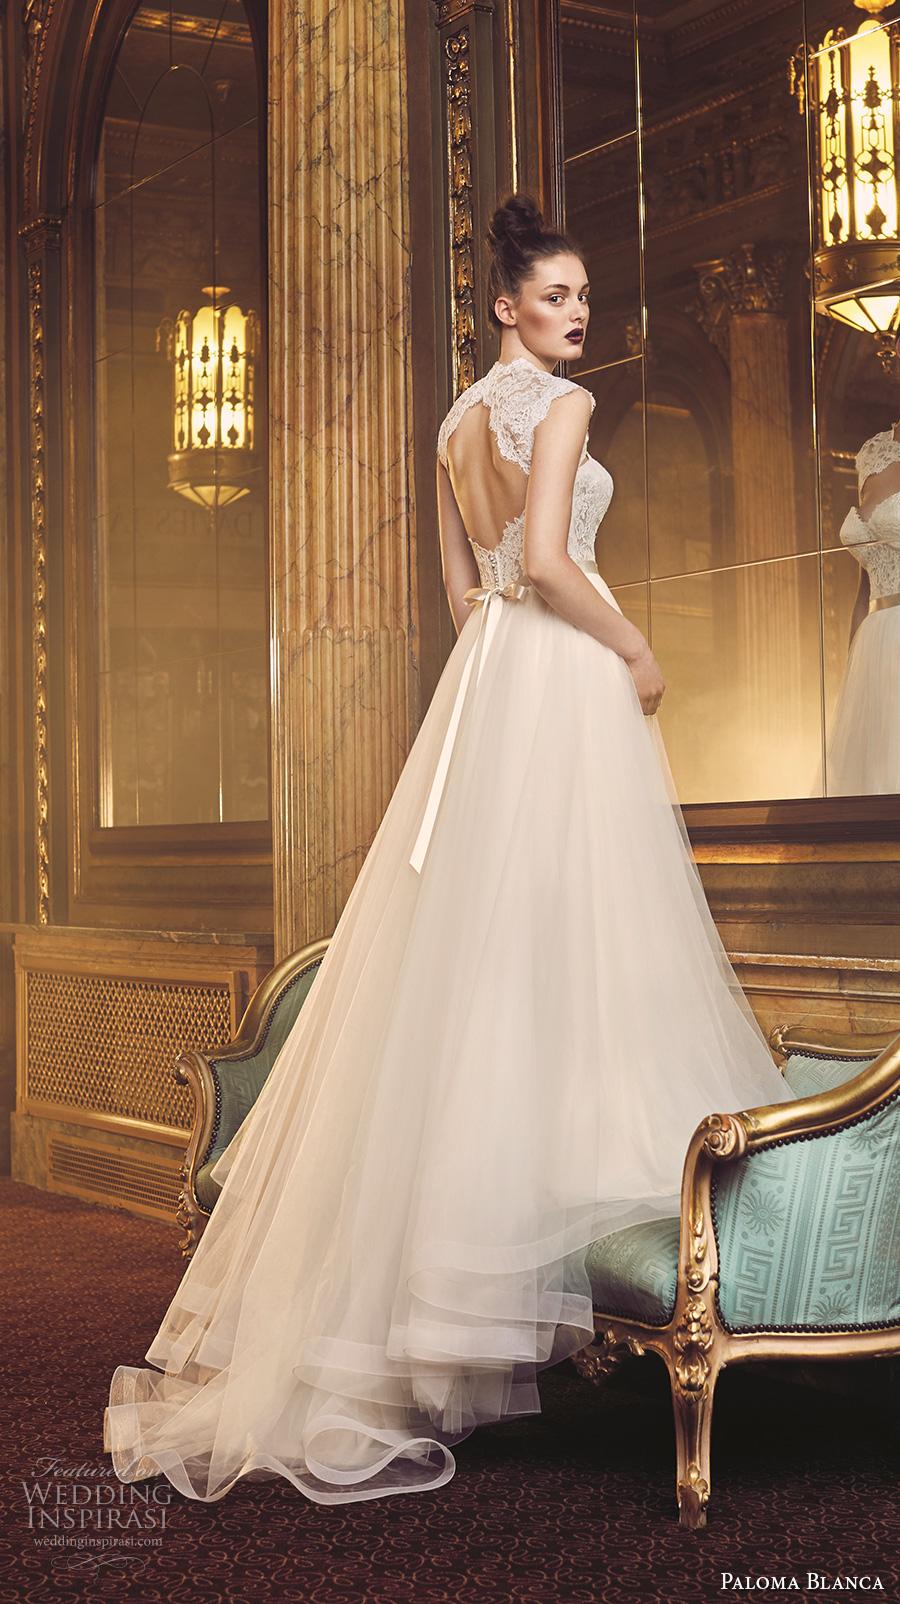 Paloma Blanca Wedding Dresses For Sale 14 Trend paloma blanca fall bridal